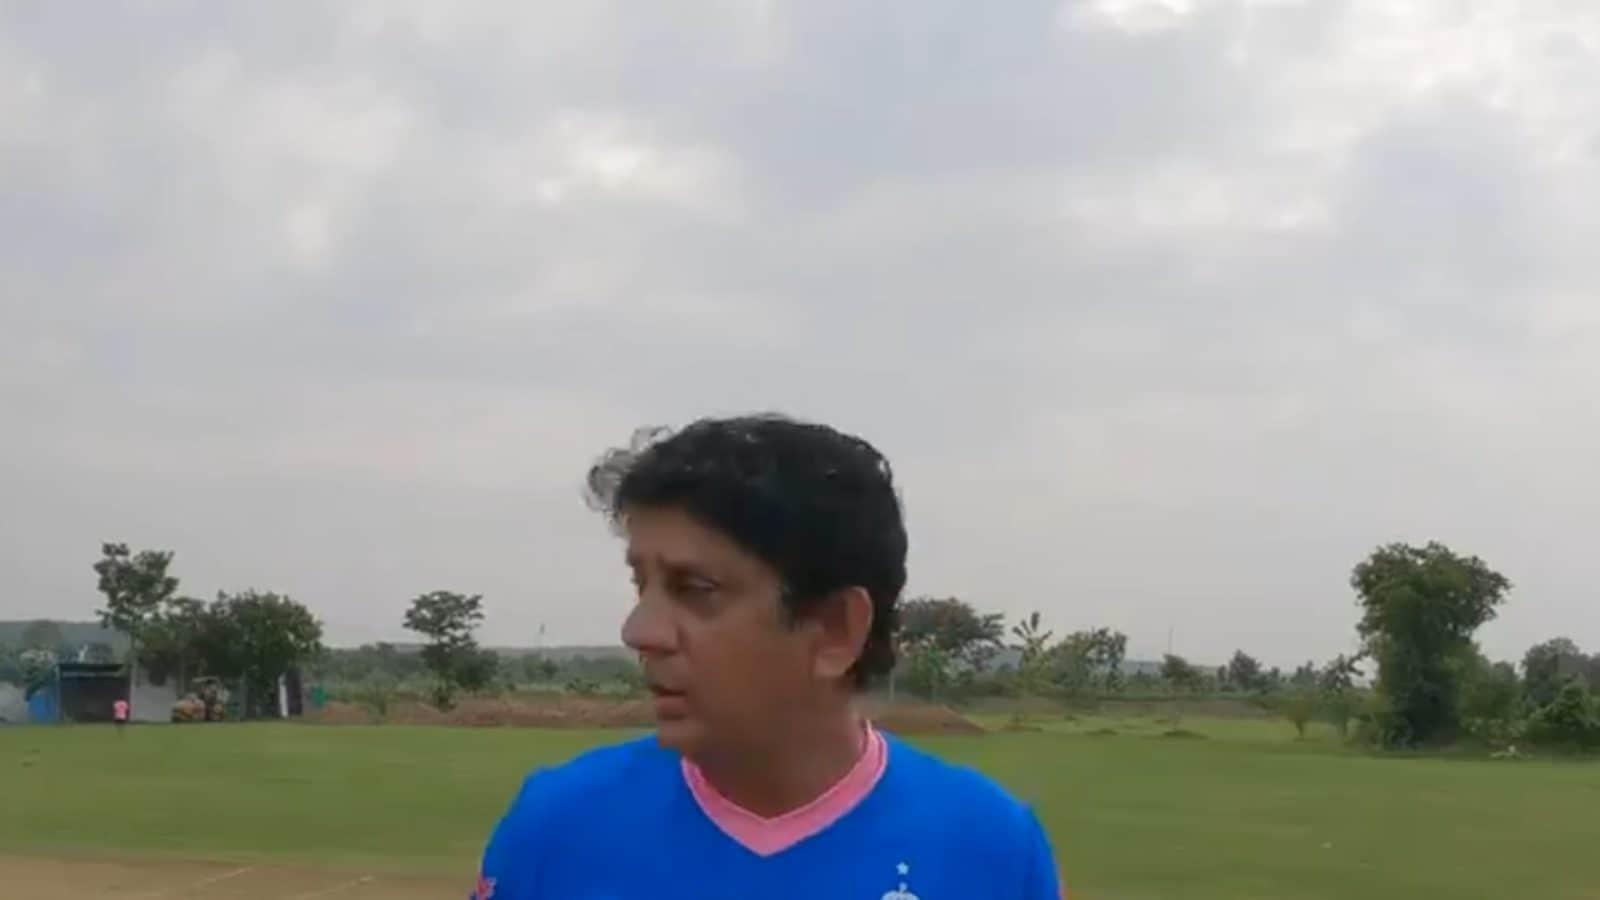 Rajasthan Royals bowlers play games to hone skills ahead ...